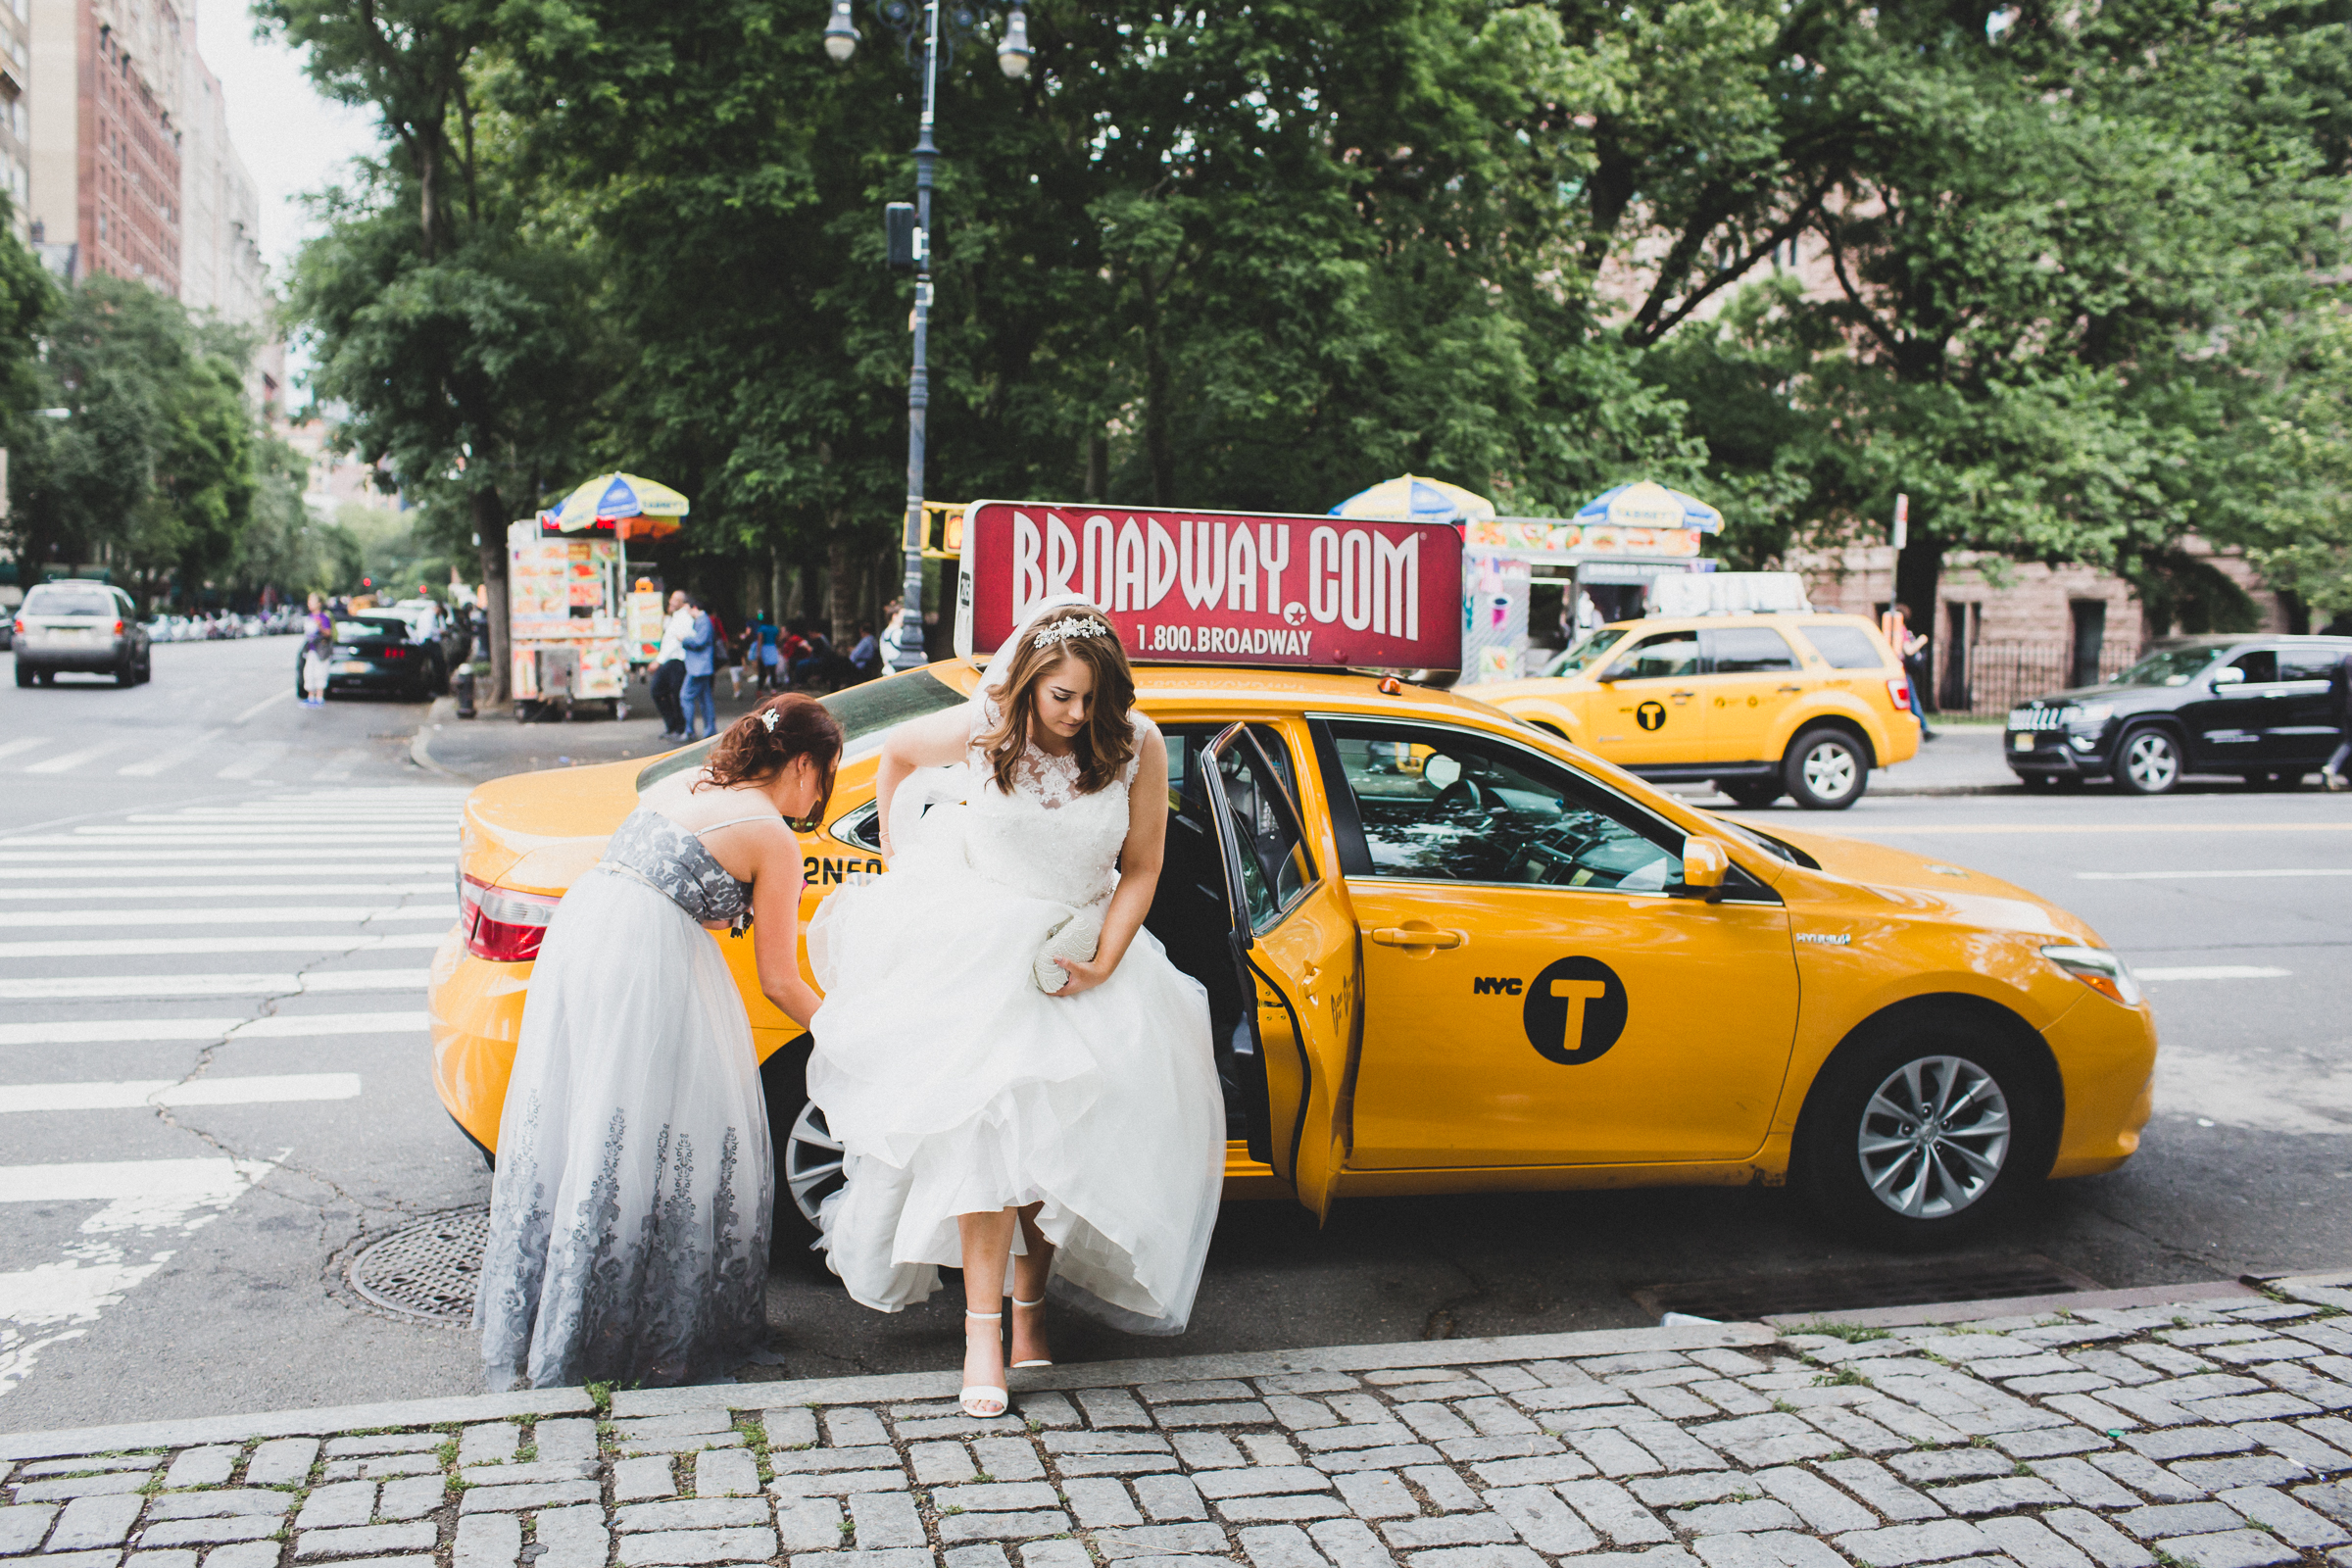 NYC-Central-Park-Elopement-New-York-Documentary-Wedding-Photographer-Dumbo-Brooklyn-Bridge-Park--10.jpg